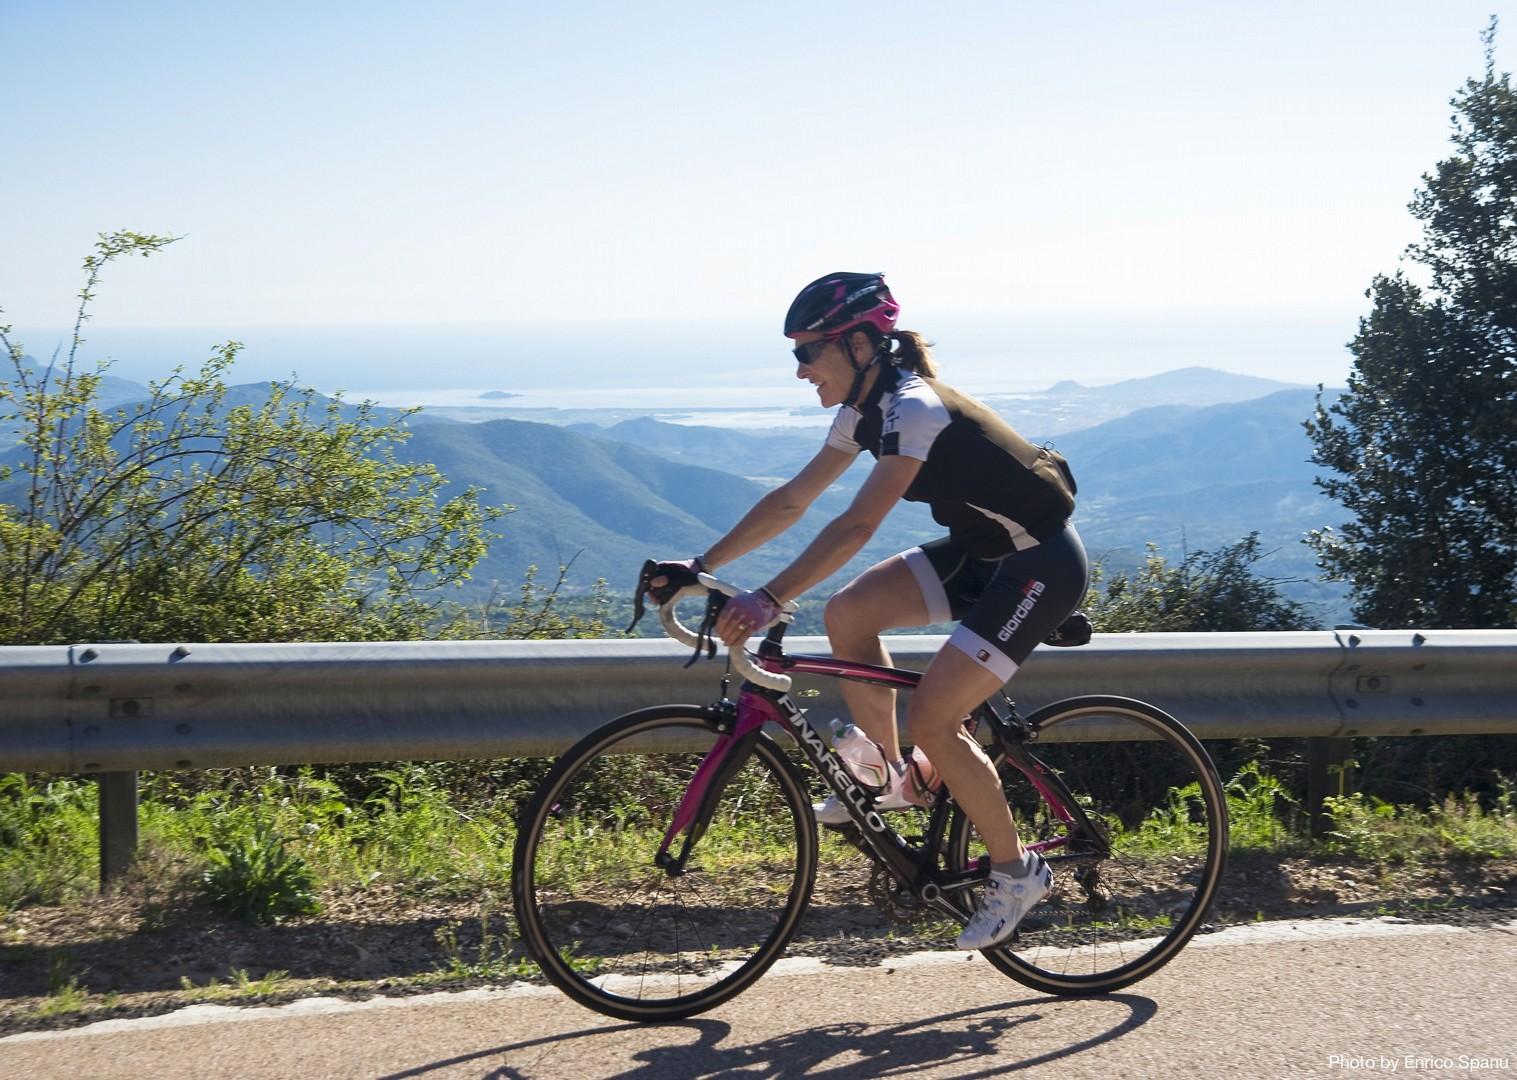 Guided-Road-Cycling-Holiday-Sardinia-Sardinian-Mountains-Monte-Corrasi.jpg - Italy - Sardinia - Mountain Explorer - Guided Road Cycling Holiday - Italia Road Cycling